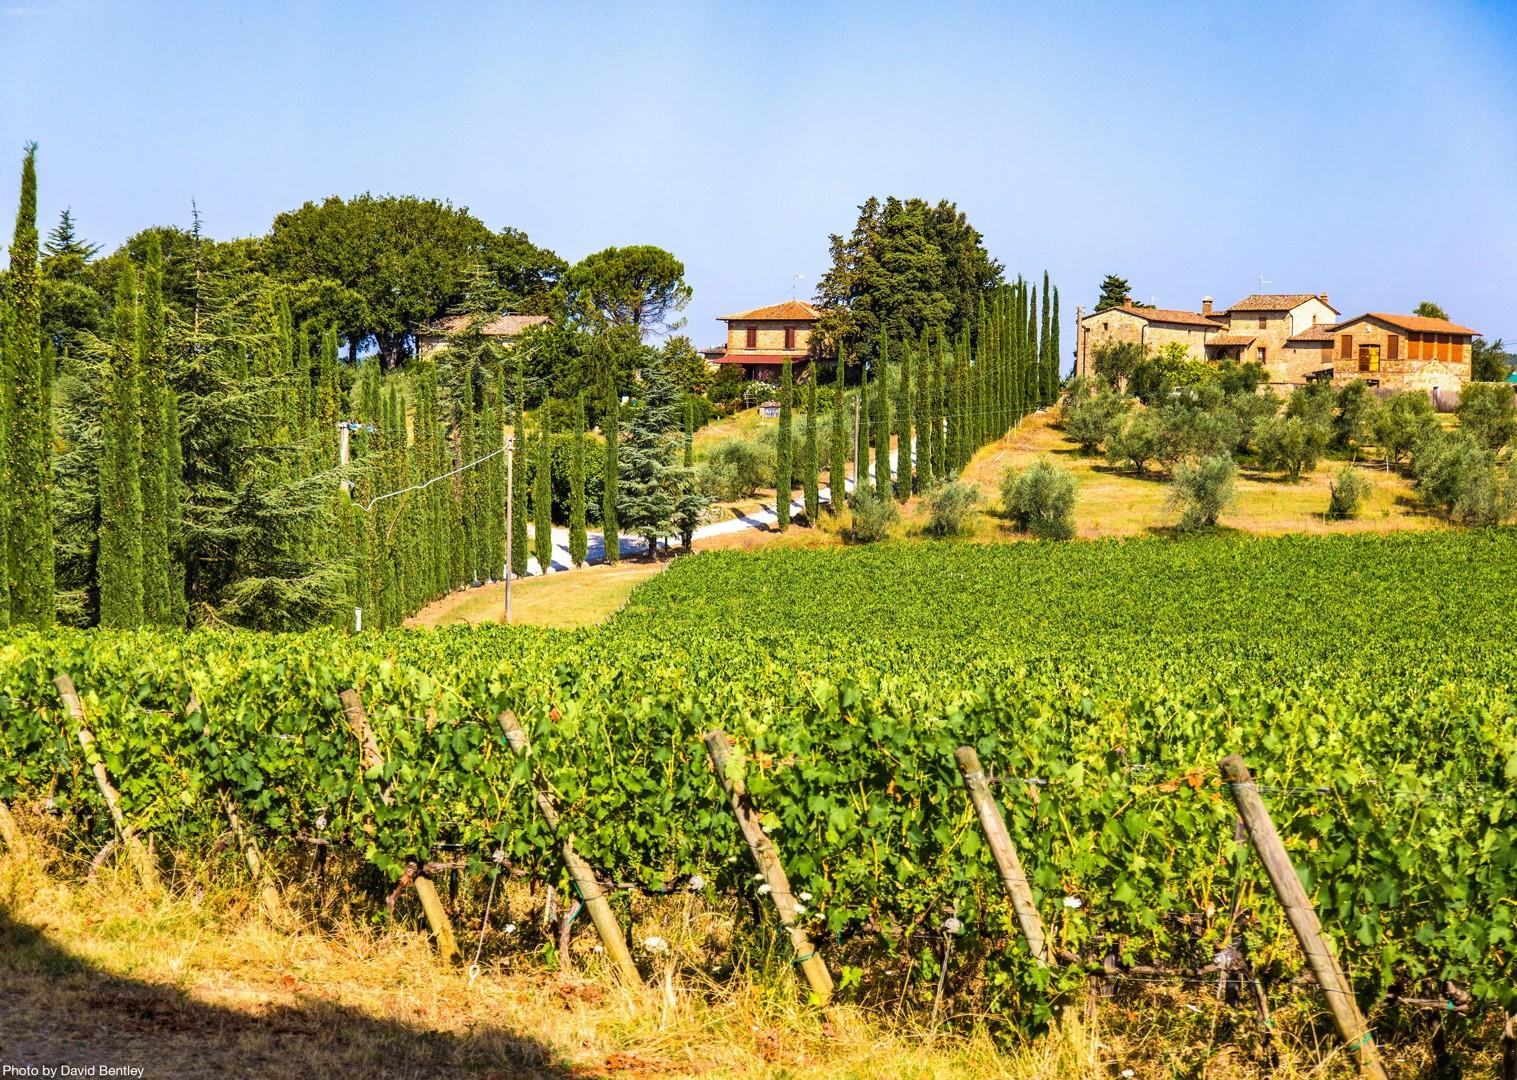 0077 Day 4 Chianti Region.jpg - Italy - Tuscany - Giro della Toscana - Self-Guided Road Cycling Holiday - Road Cycling